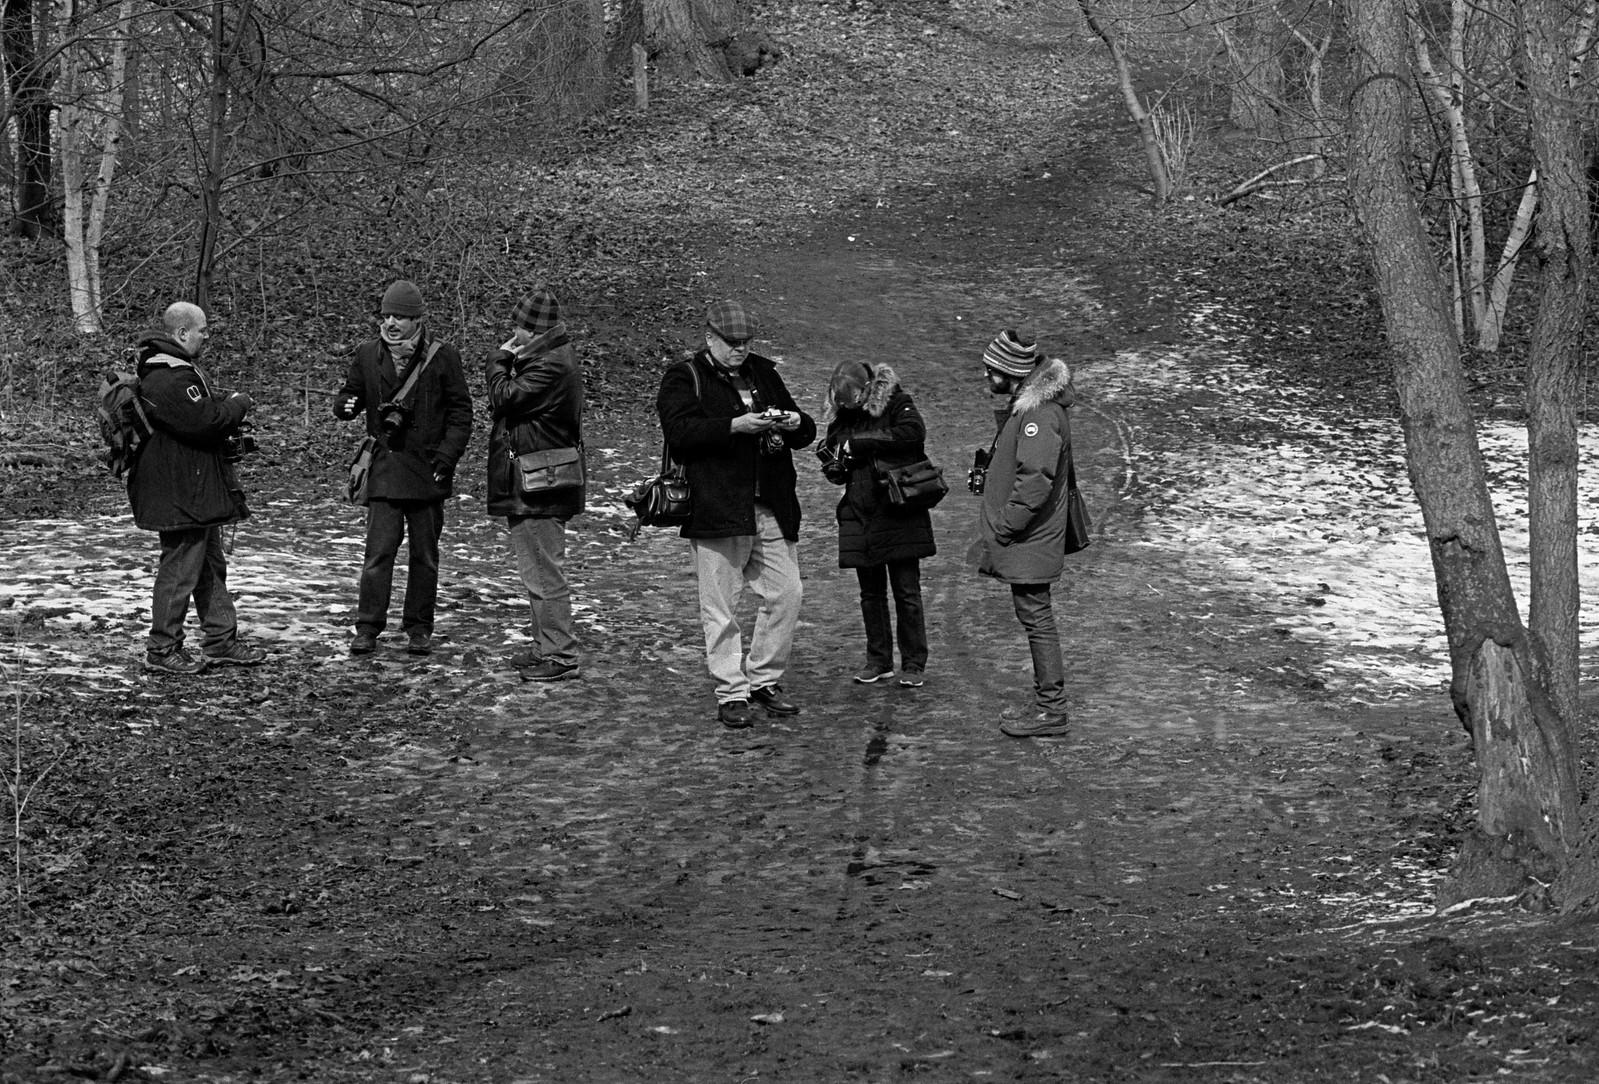 TFSM Winter '16 - Muddy York